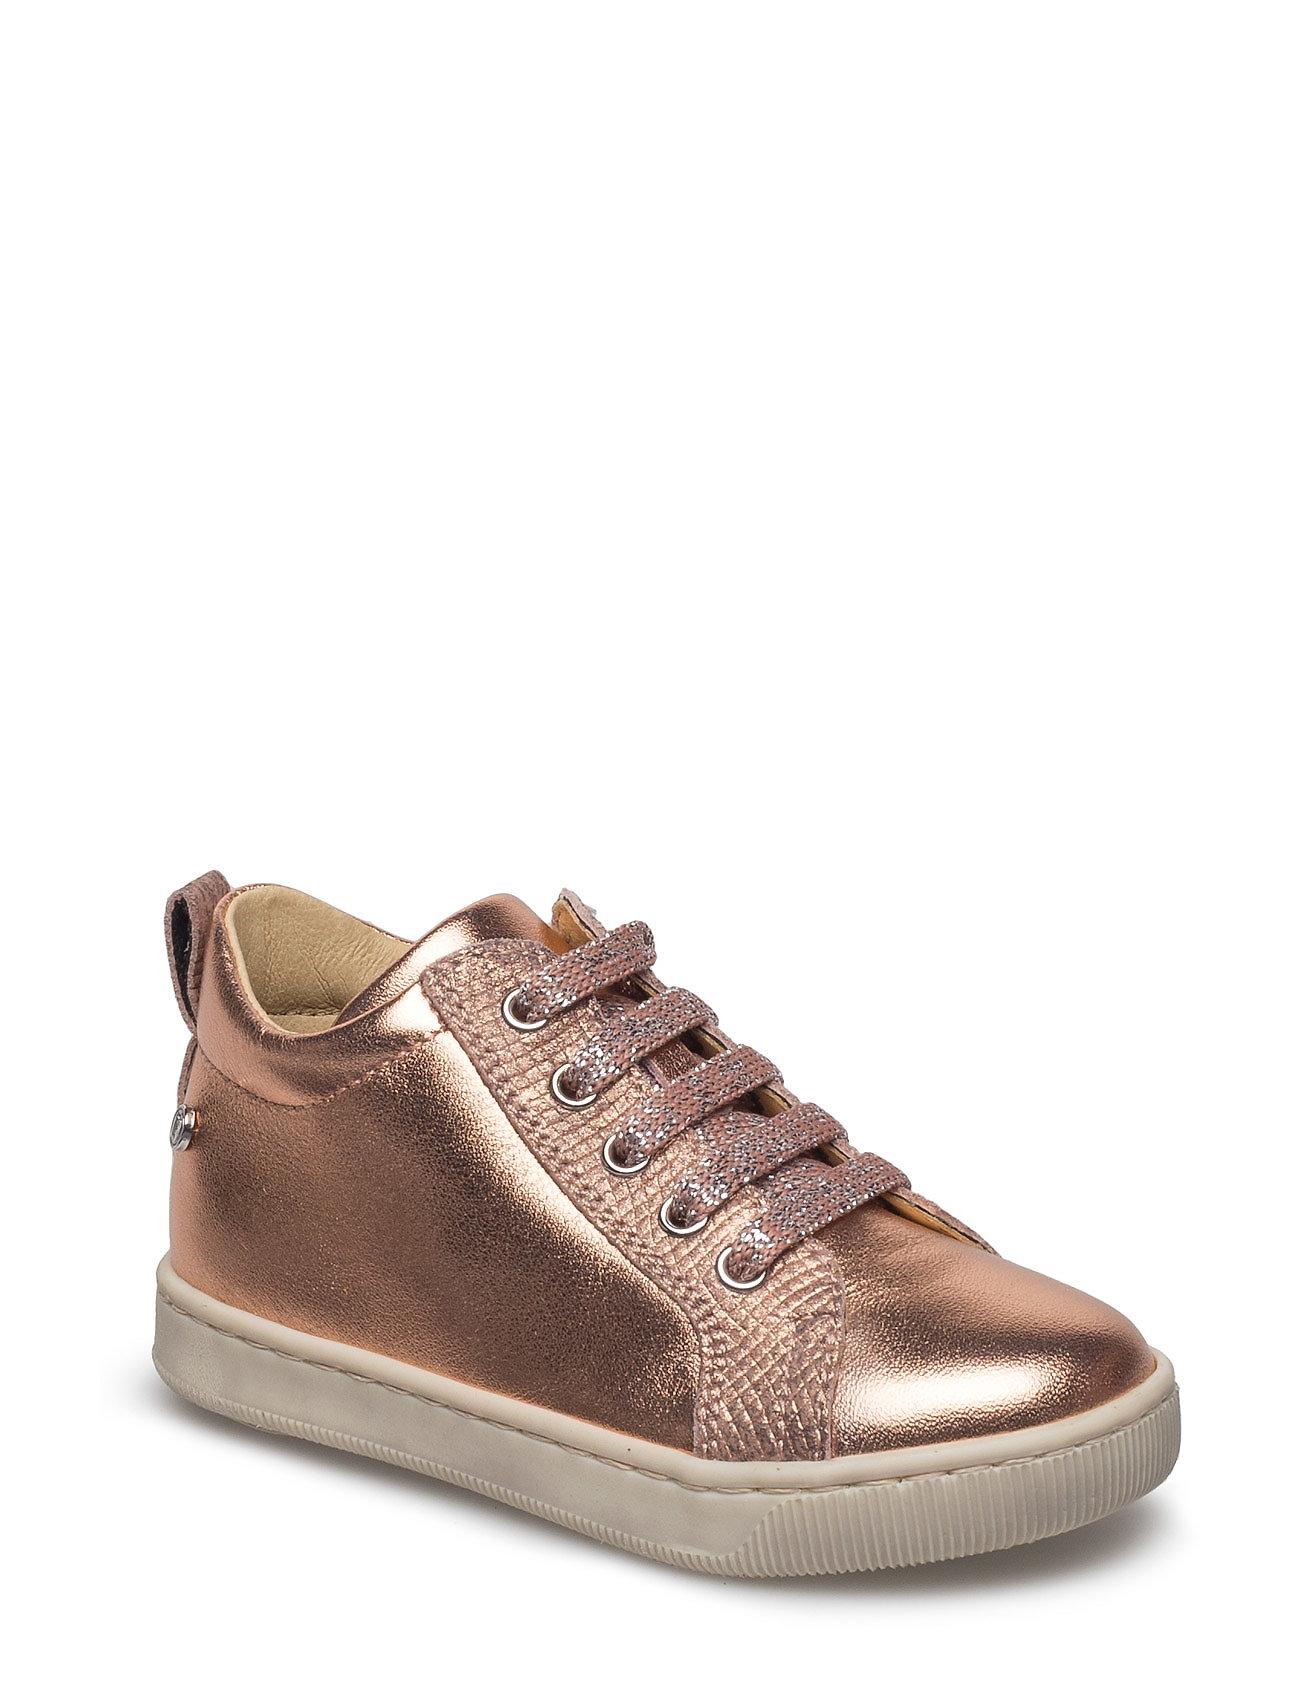 Falcotto Haley Naturino Sko & Sneakers til Børn i Rosa